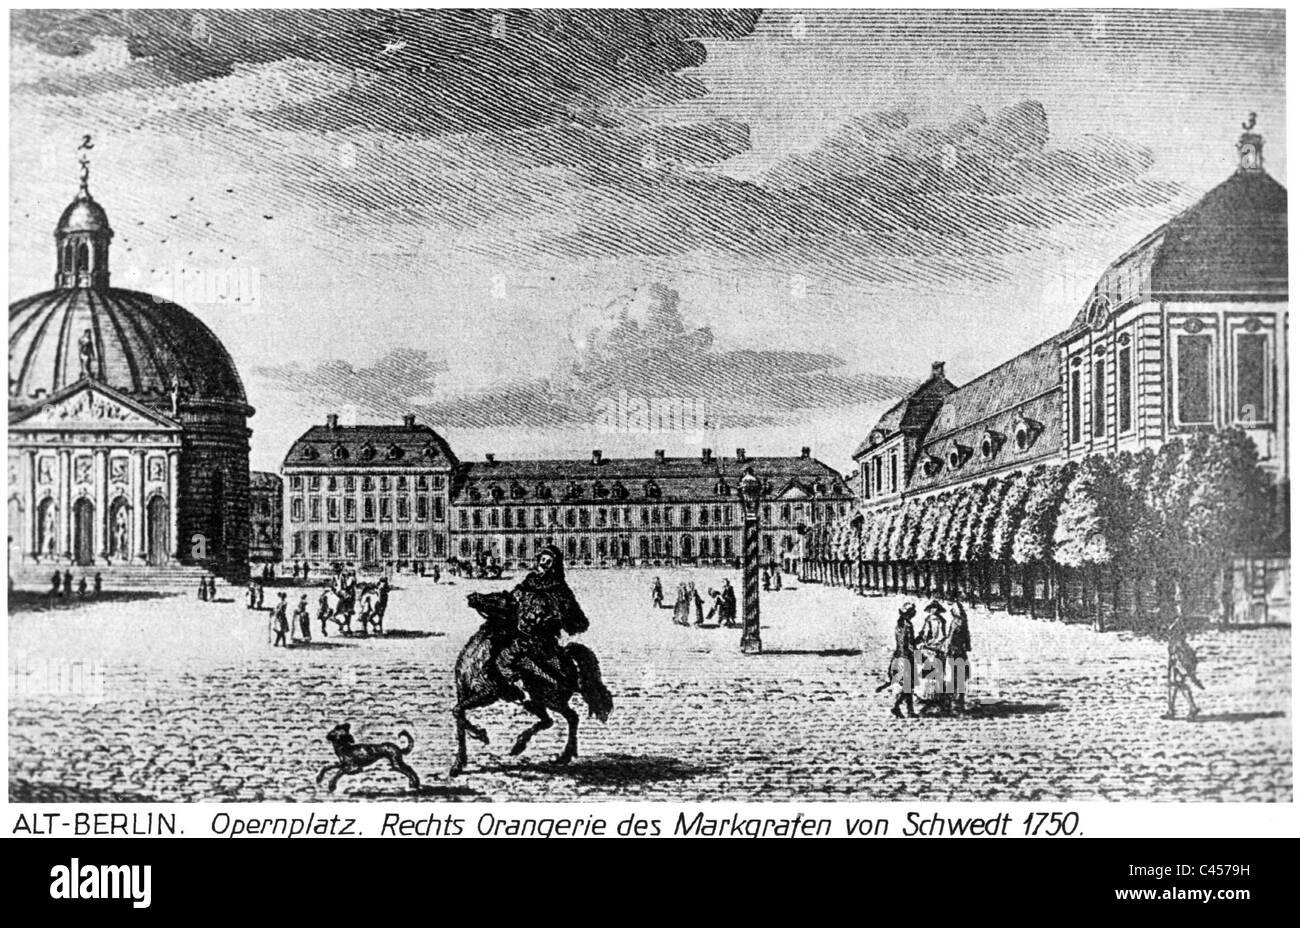 Opernplatz in Berlin, 1750 - Stock Image